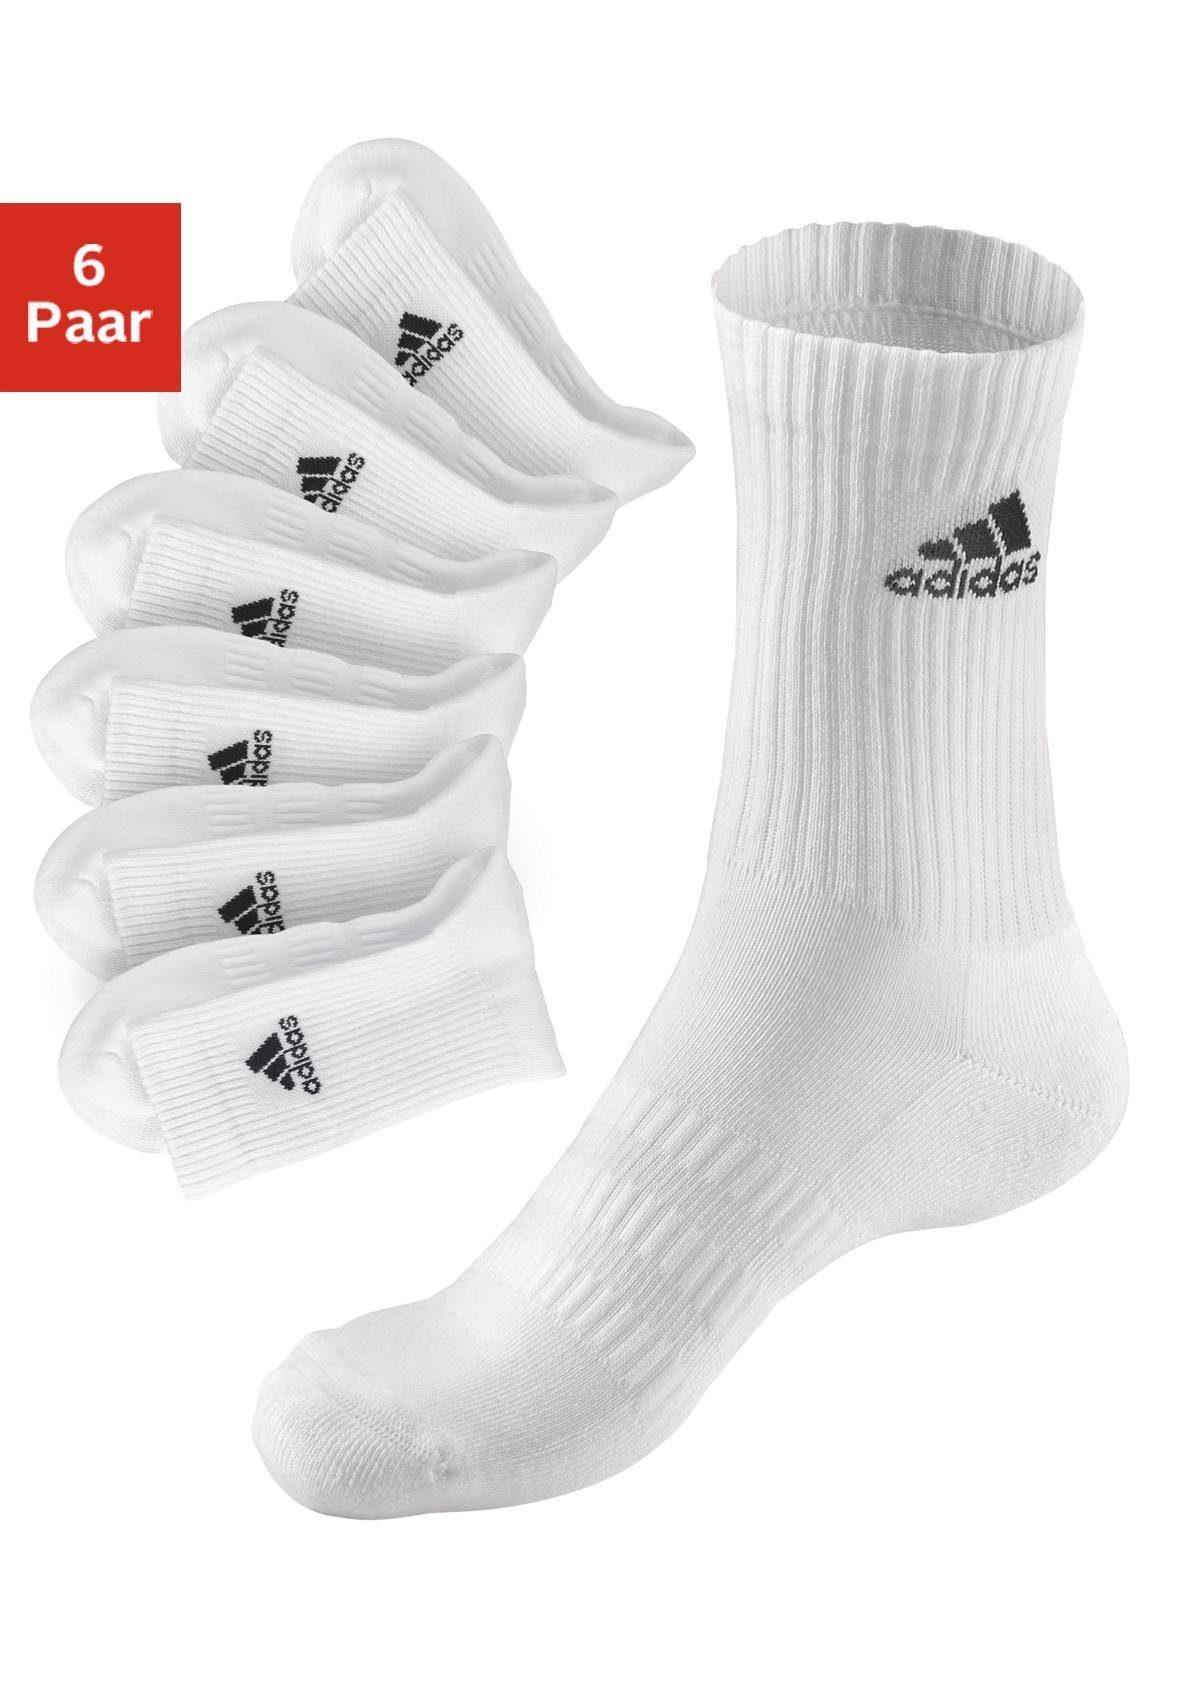 adidas Performance Tennissocken (6 Paar)